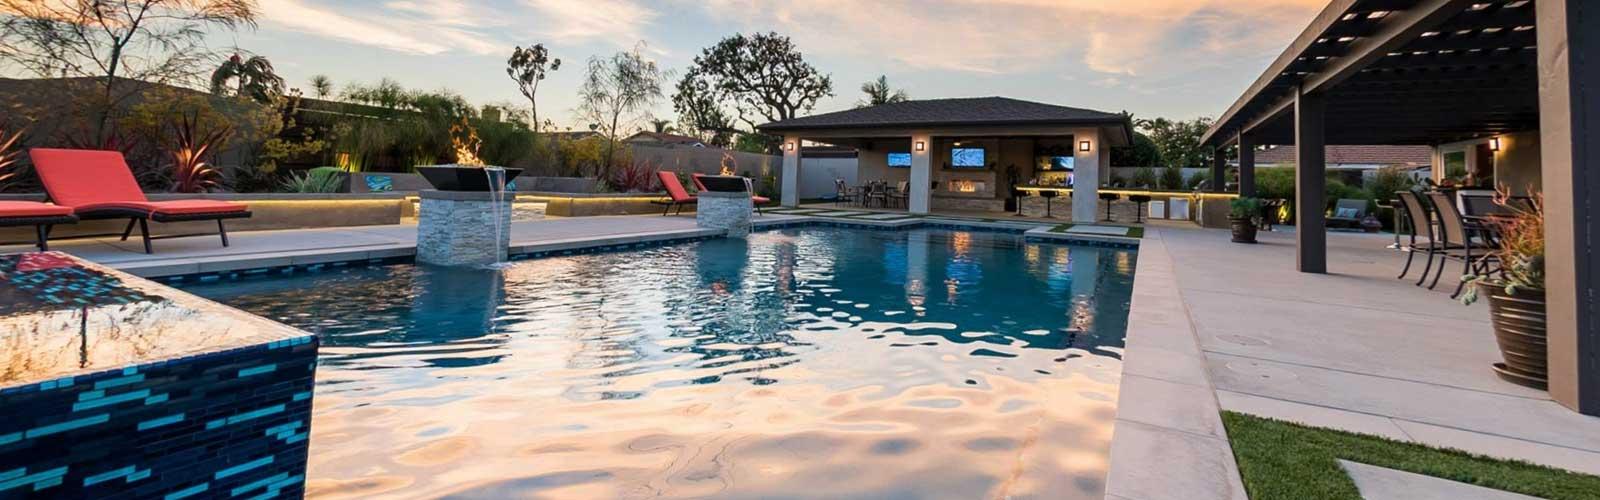 Swimming pool landscape design orange county ca for Pool design orange county ca